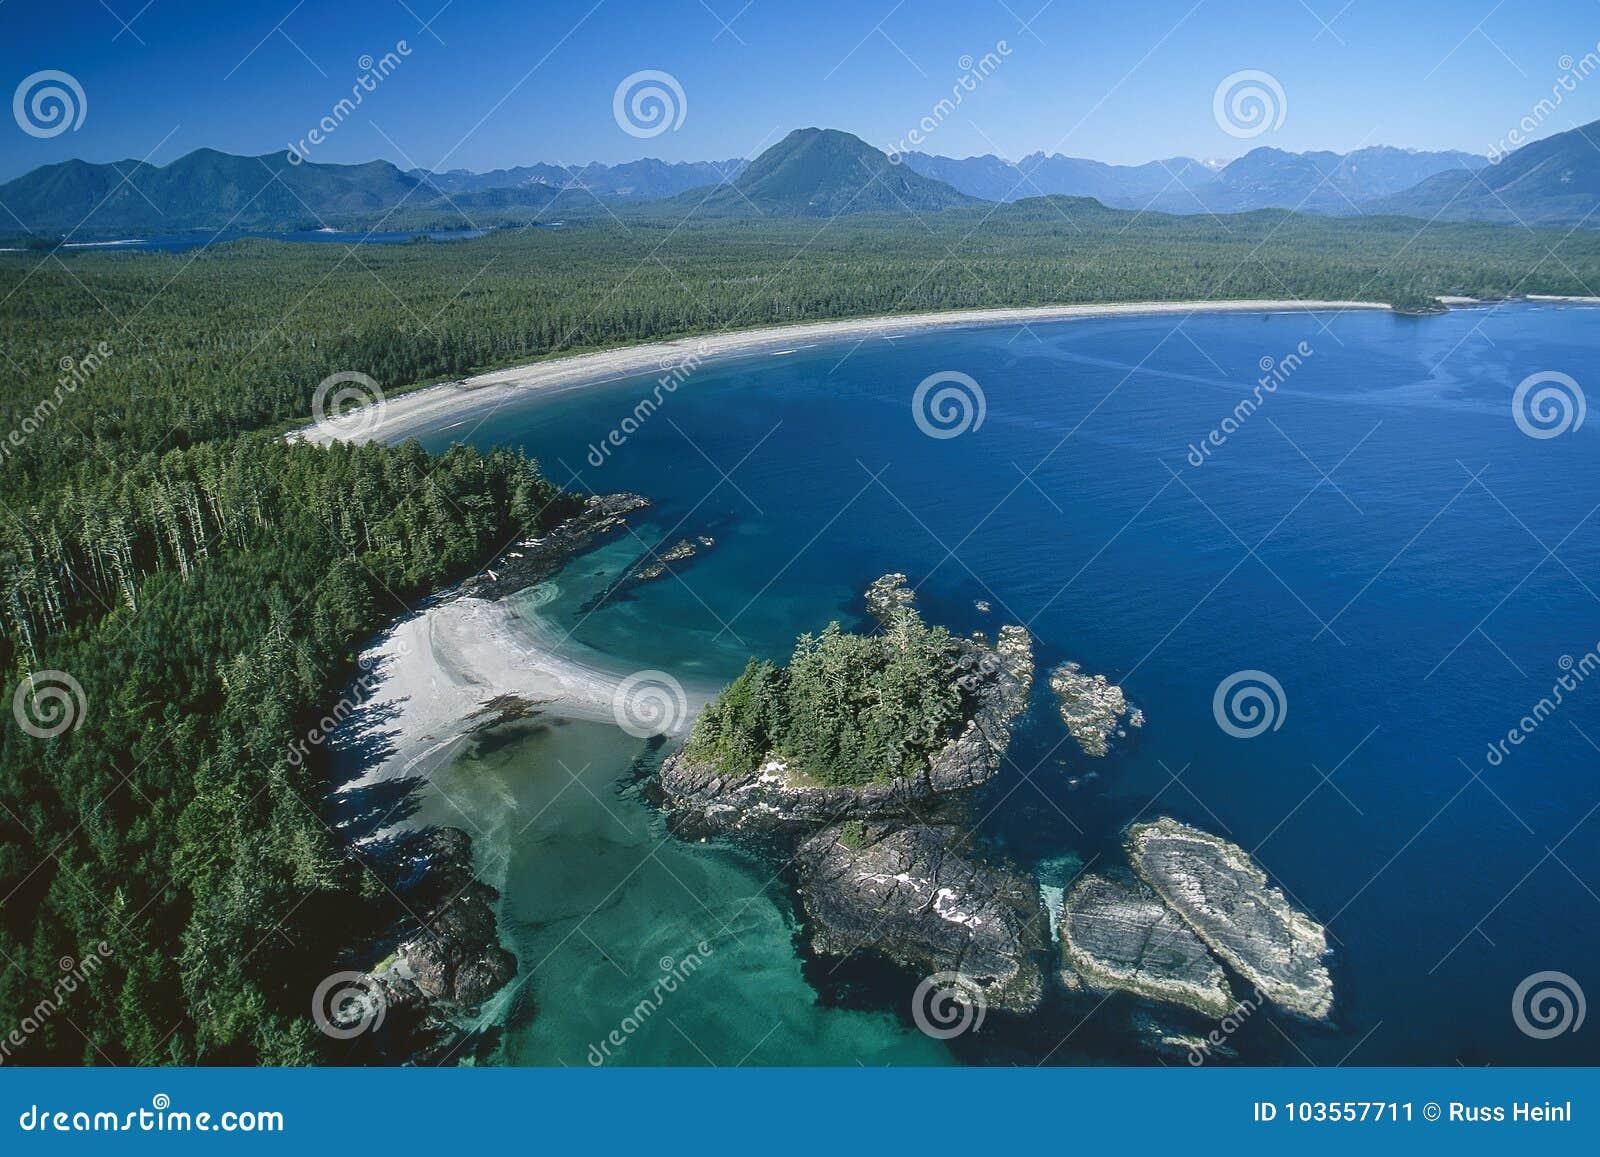 Aerial image of Vargas Island, BC